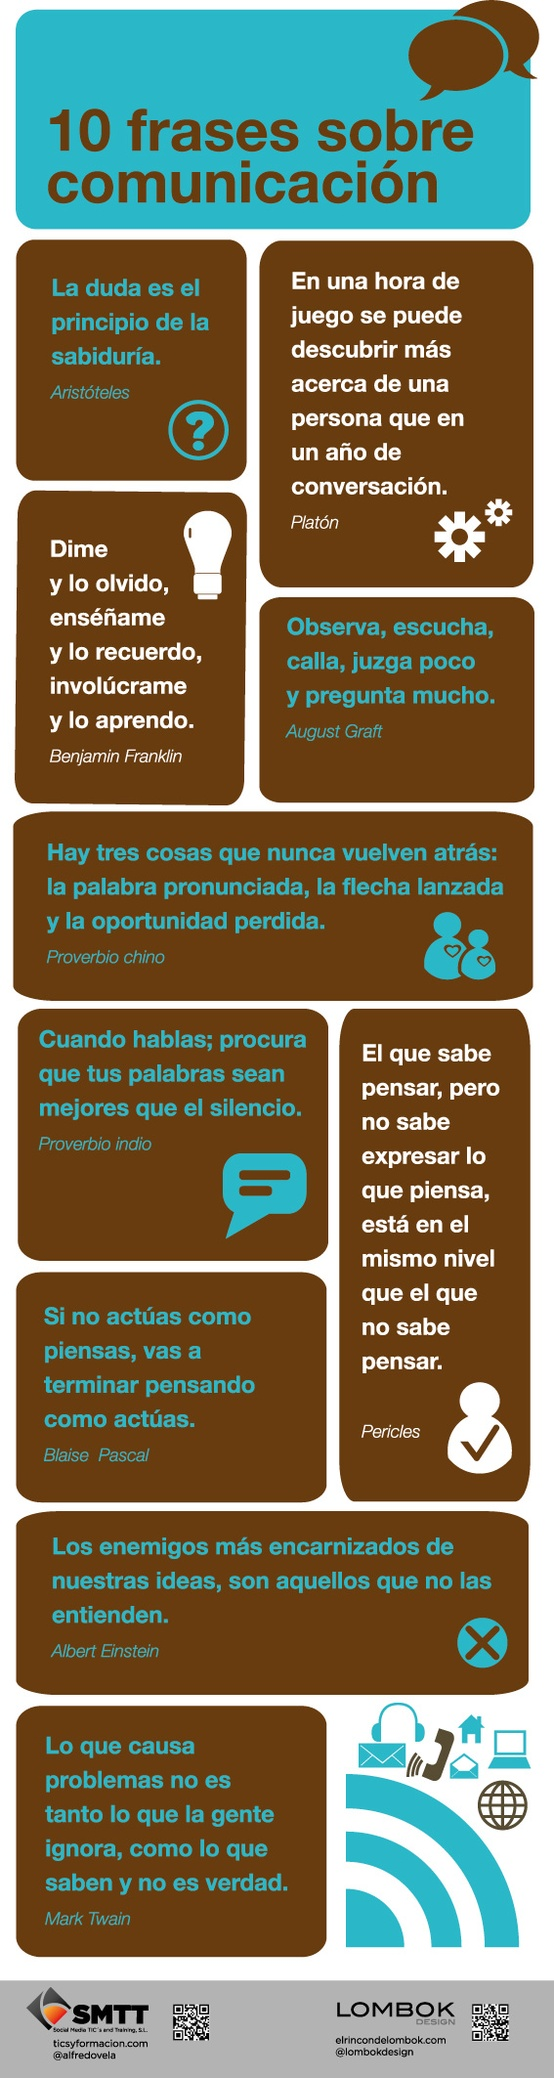 10 frases de comunicacion #infografia #frase